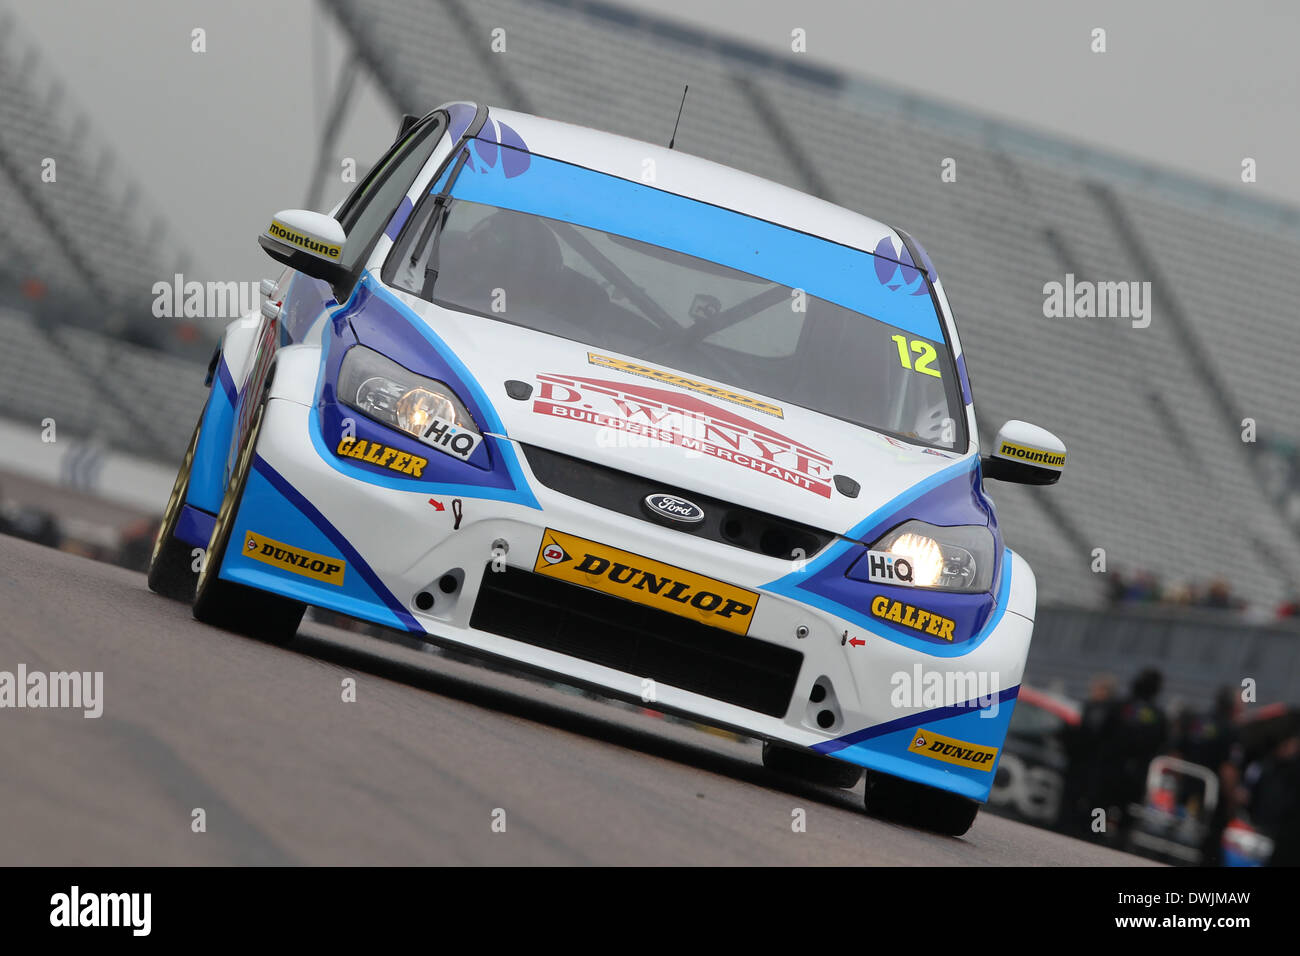 David Nye Gbr Welch Motorsport Ford Focus Stock Image